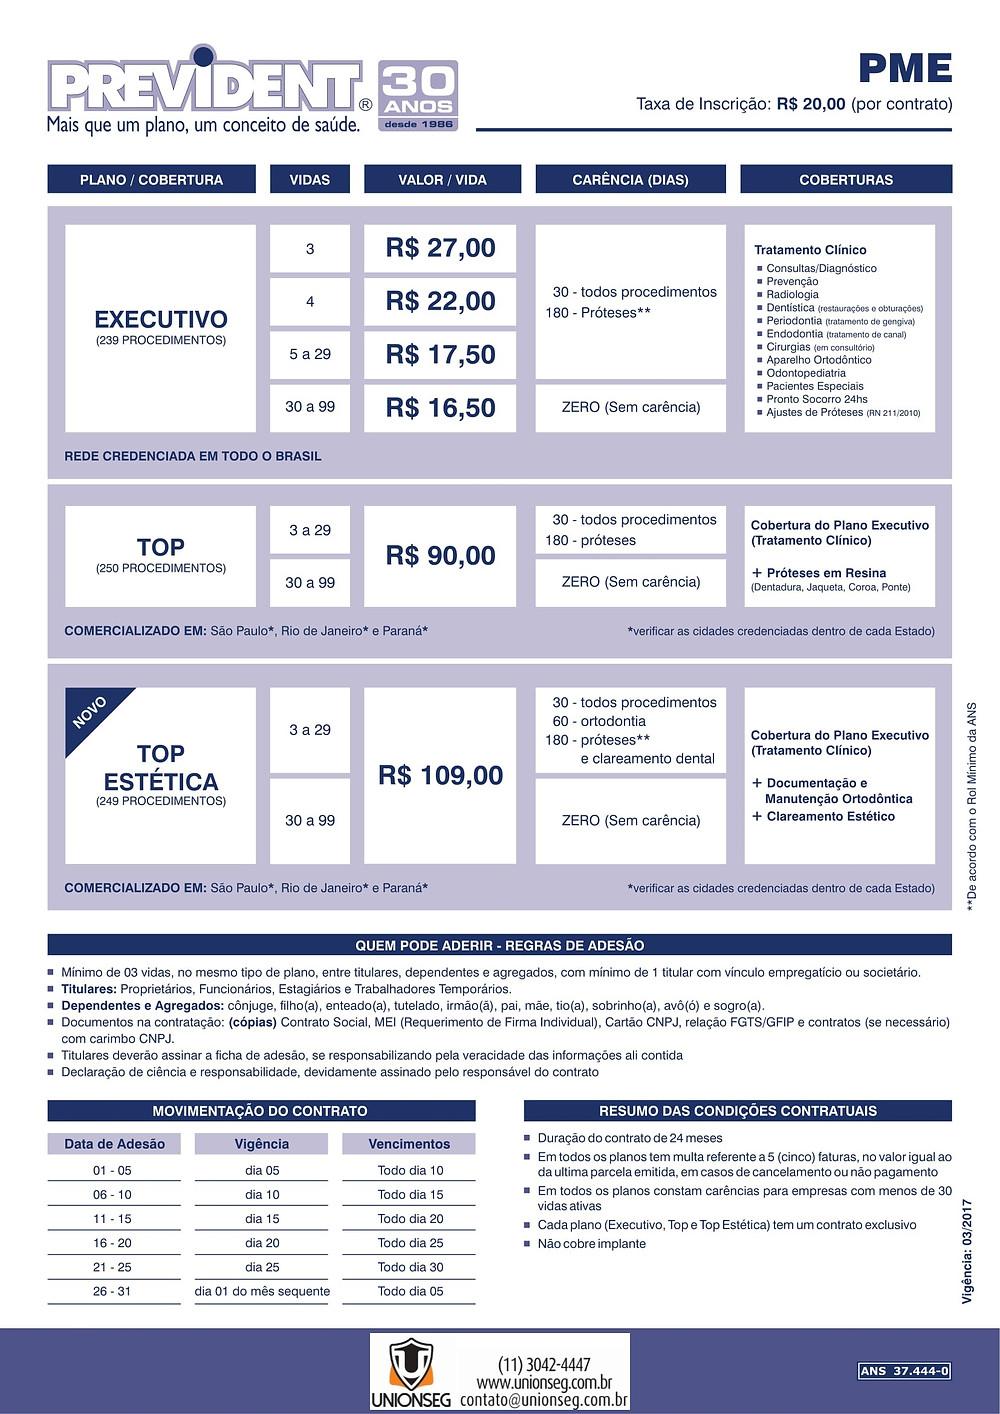 Tabela de Preço Prevident, Prevident, Prevident PJ, Prevident PME, Plano Odontológico, Plano Odontológico PME, Odonto Empresarial, Unionseg, Corretora de Seguros